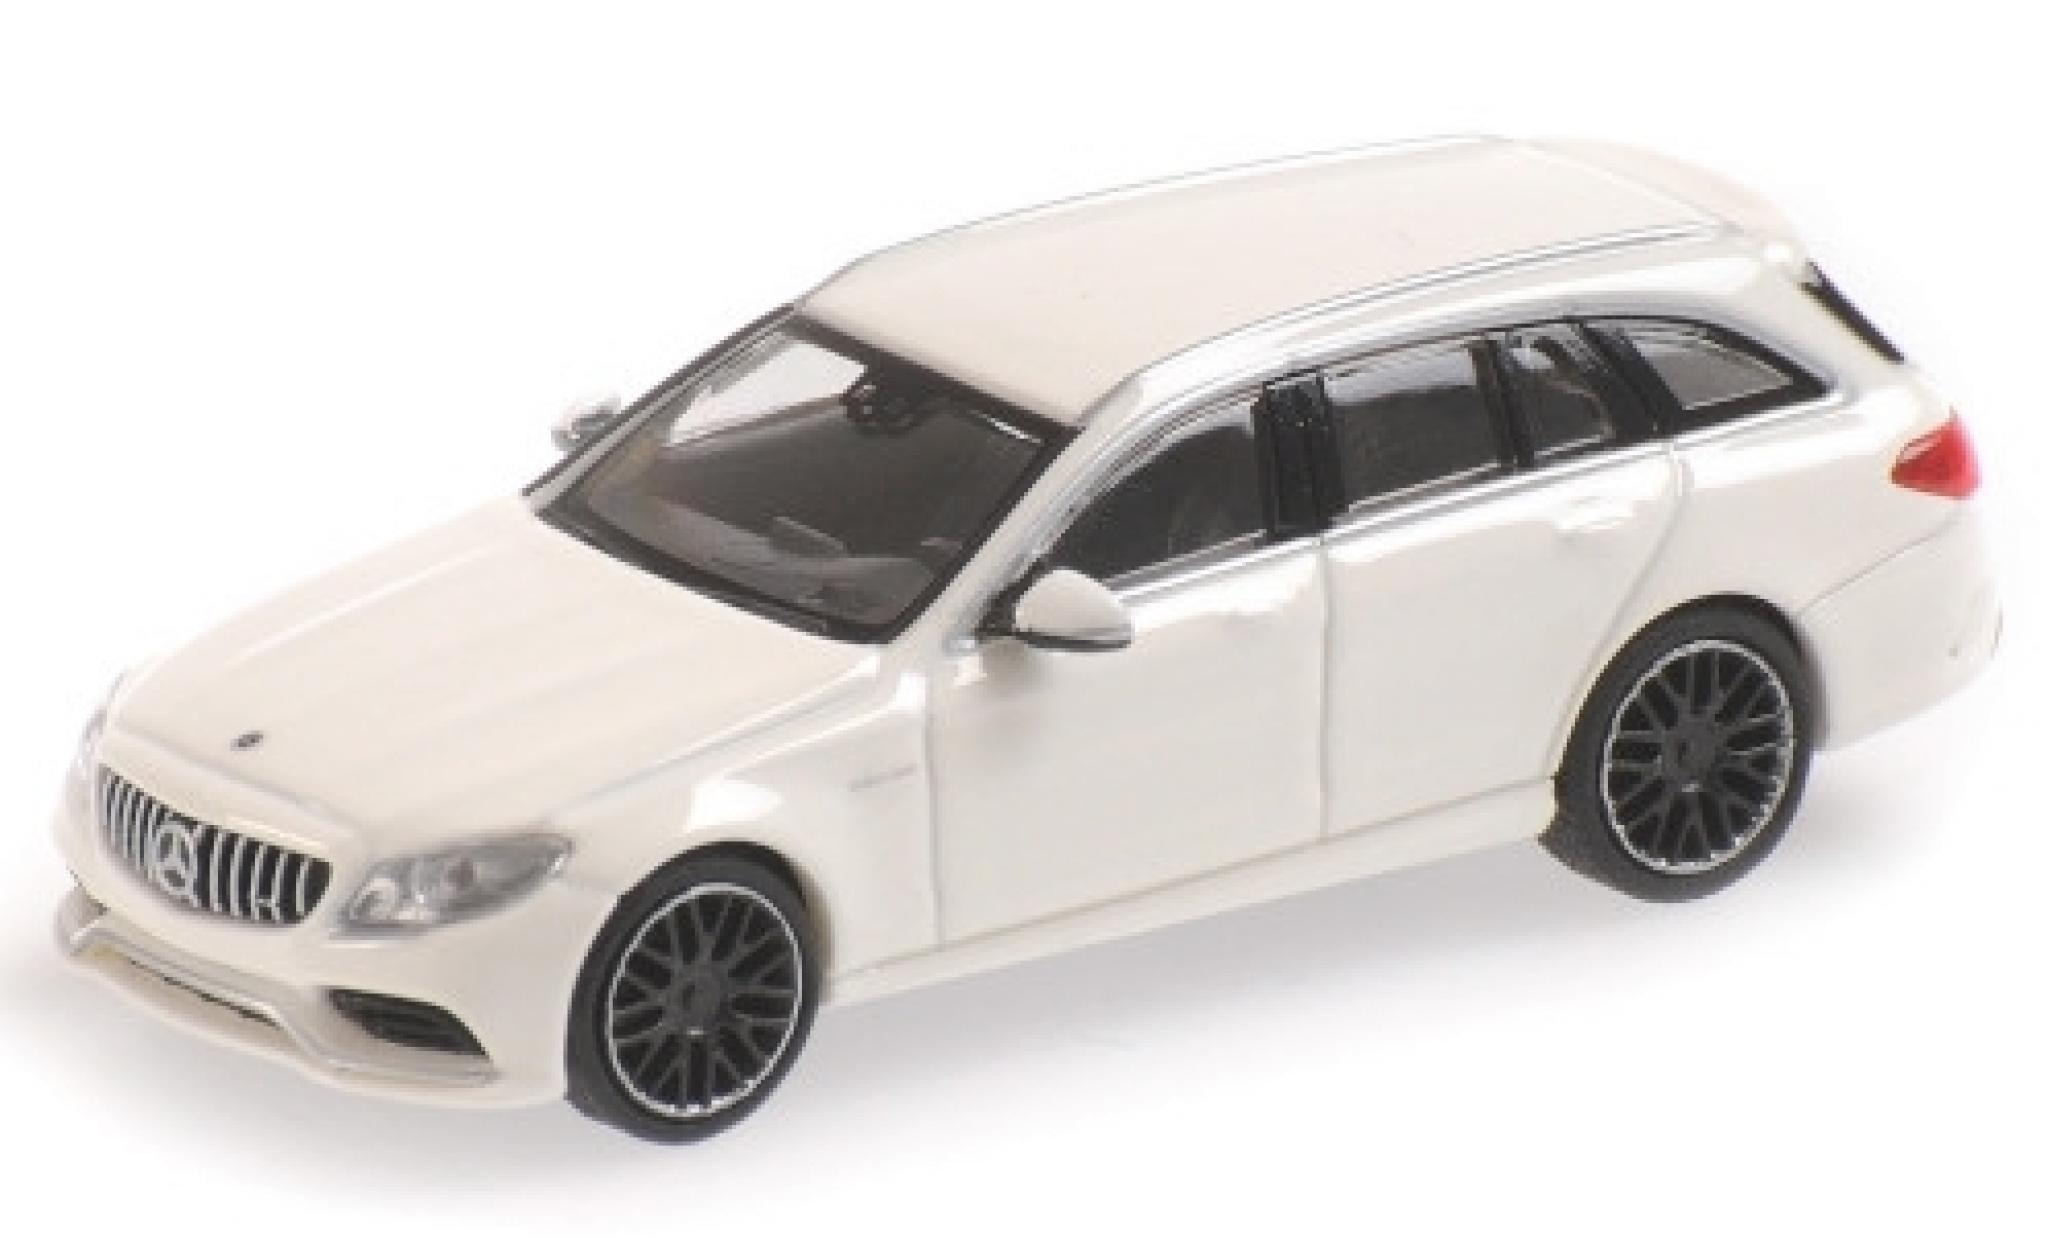 Mercedes Classe C 1/87 Minichamps AMG C63 T-Modell (S205) blanche 2019